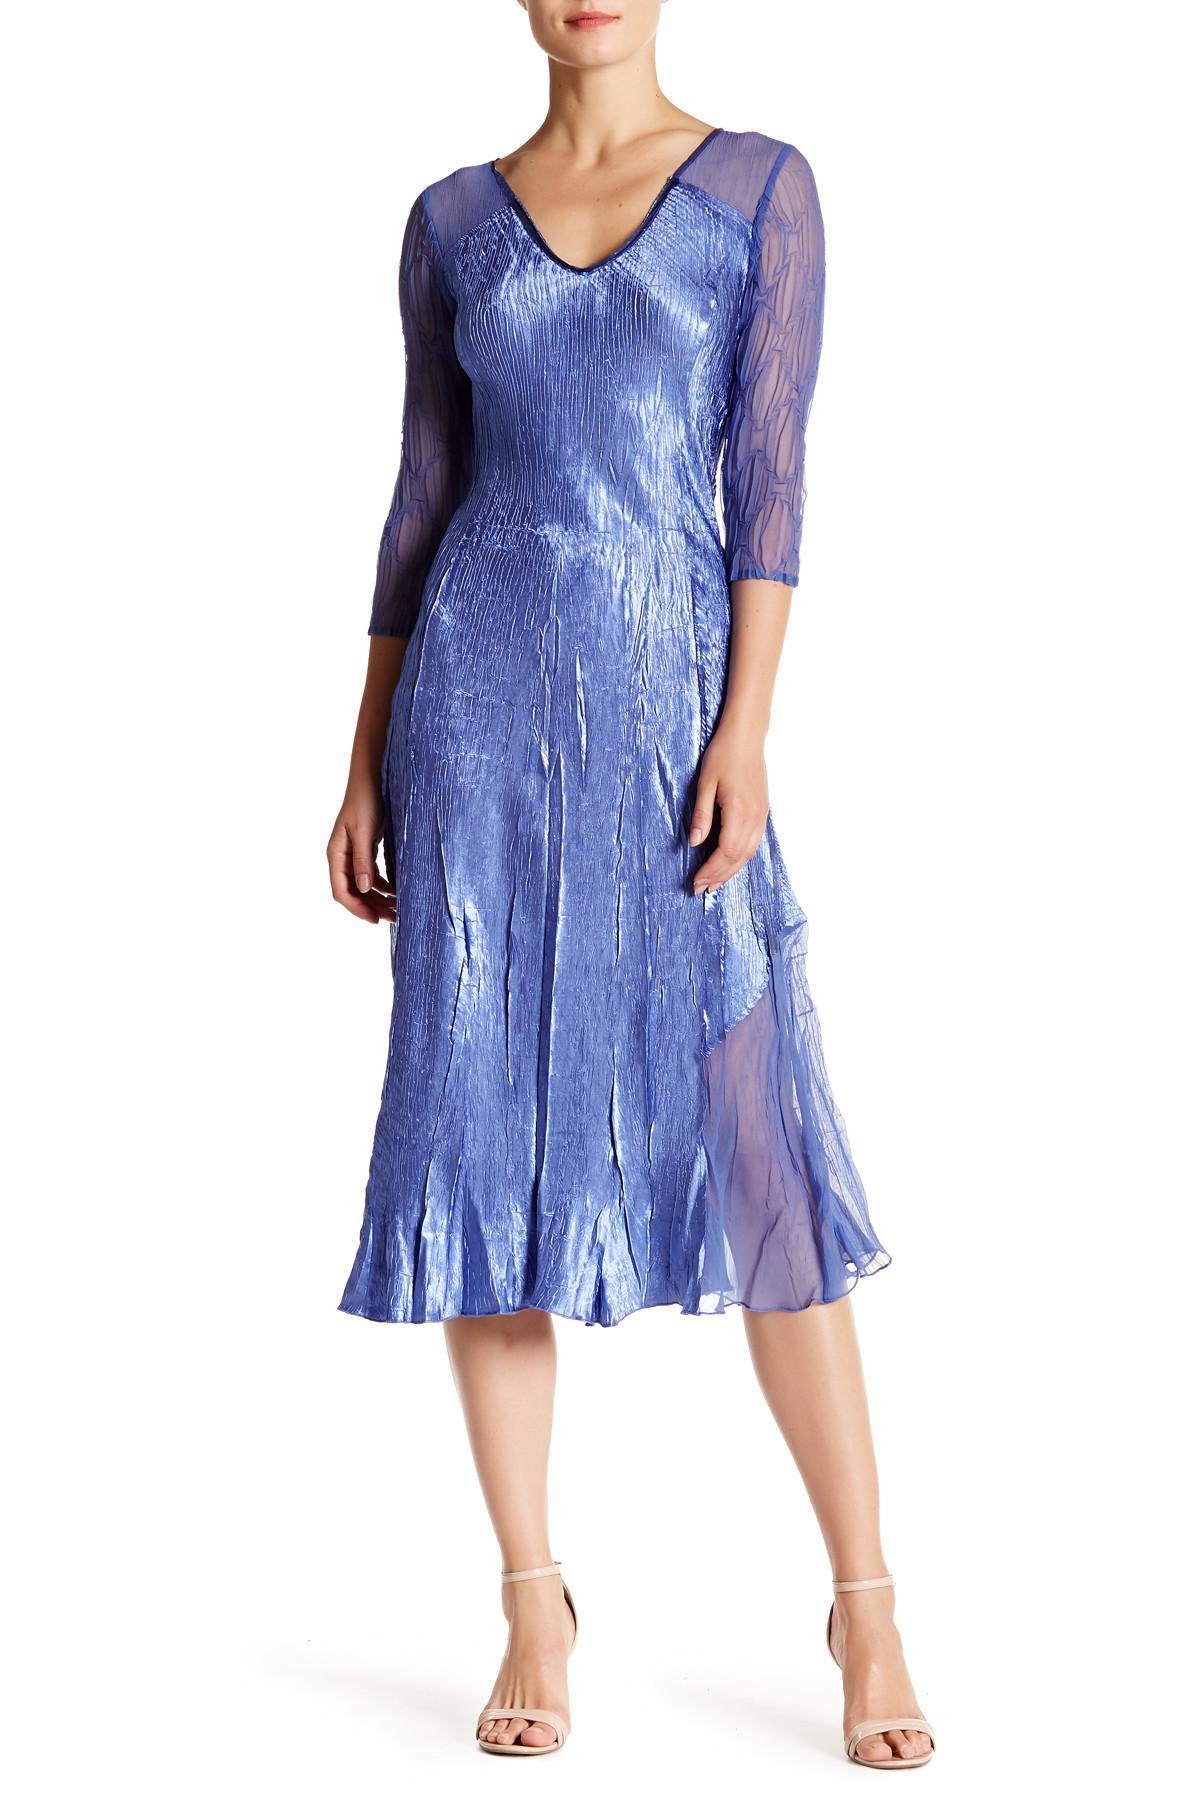 2c5f64bc42 Komarov Sequined V-neck Midi Dress in Blue - Lyst